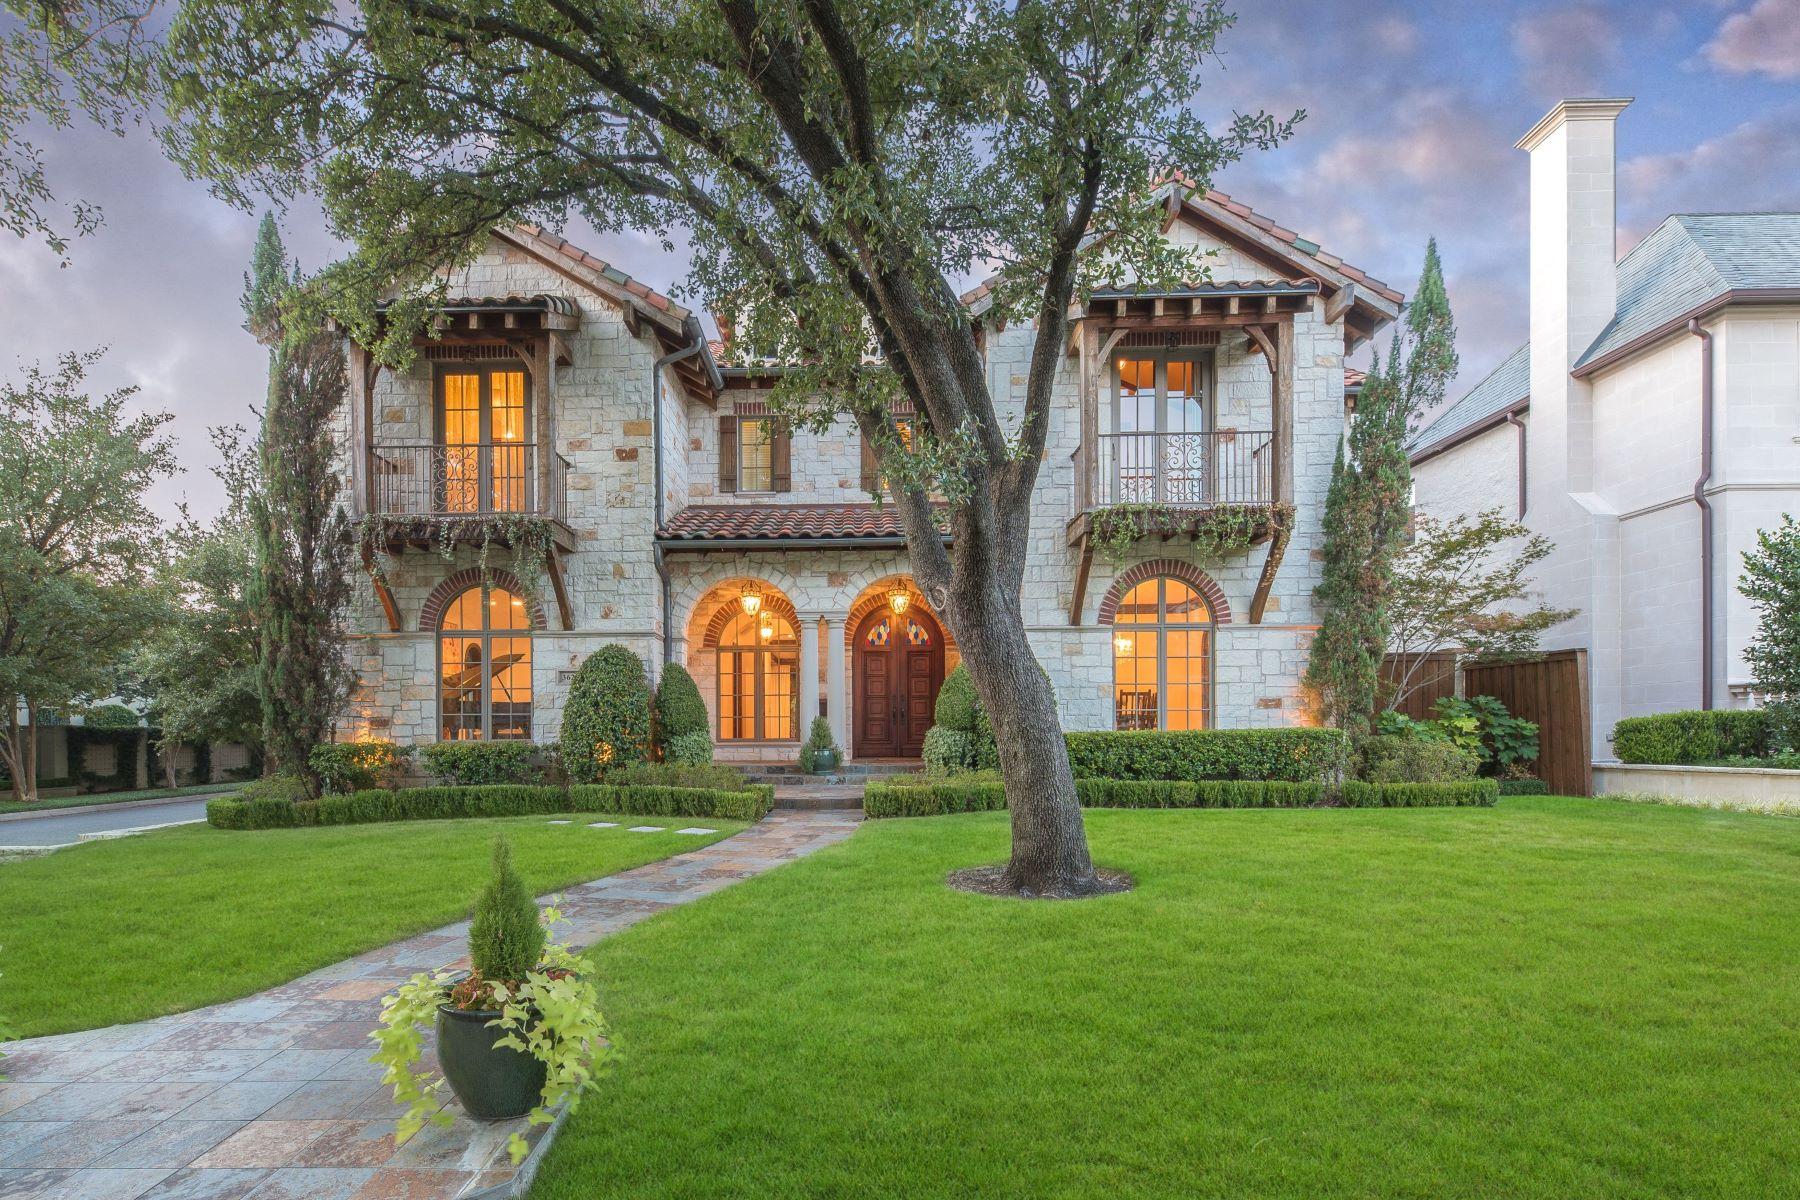 Single Family Homes for Sale at Prestigious Highland Park Mediterranean 3628 Dartmouth Avenue Highland Park, Texas 75205 United States